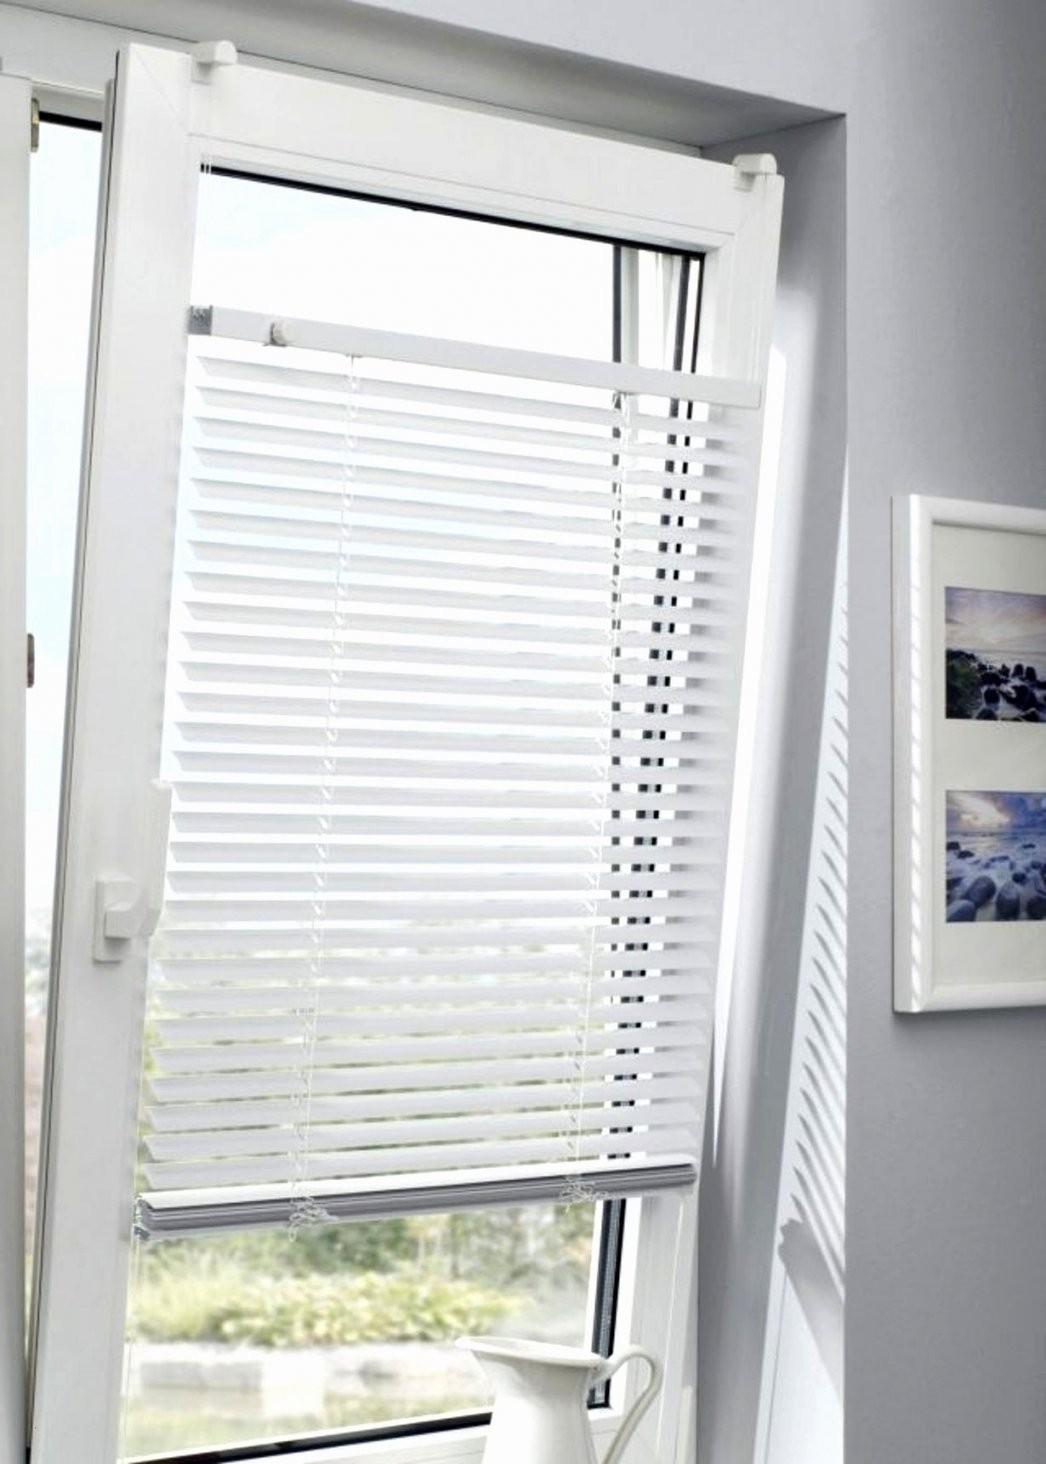 Elegant Fenster Jalousien Innen Ohne Bohren  Lapetitemaisonnyc von Fenster Jalousien Innen Ohne Bohren Bild